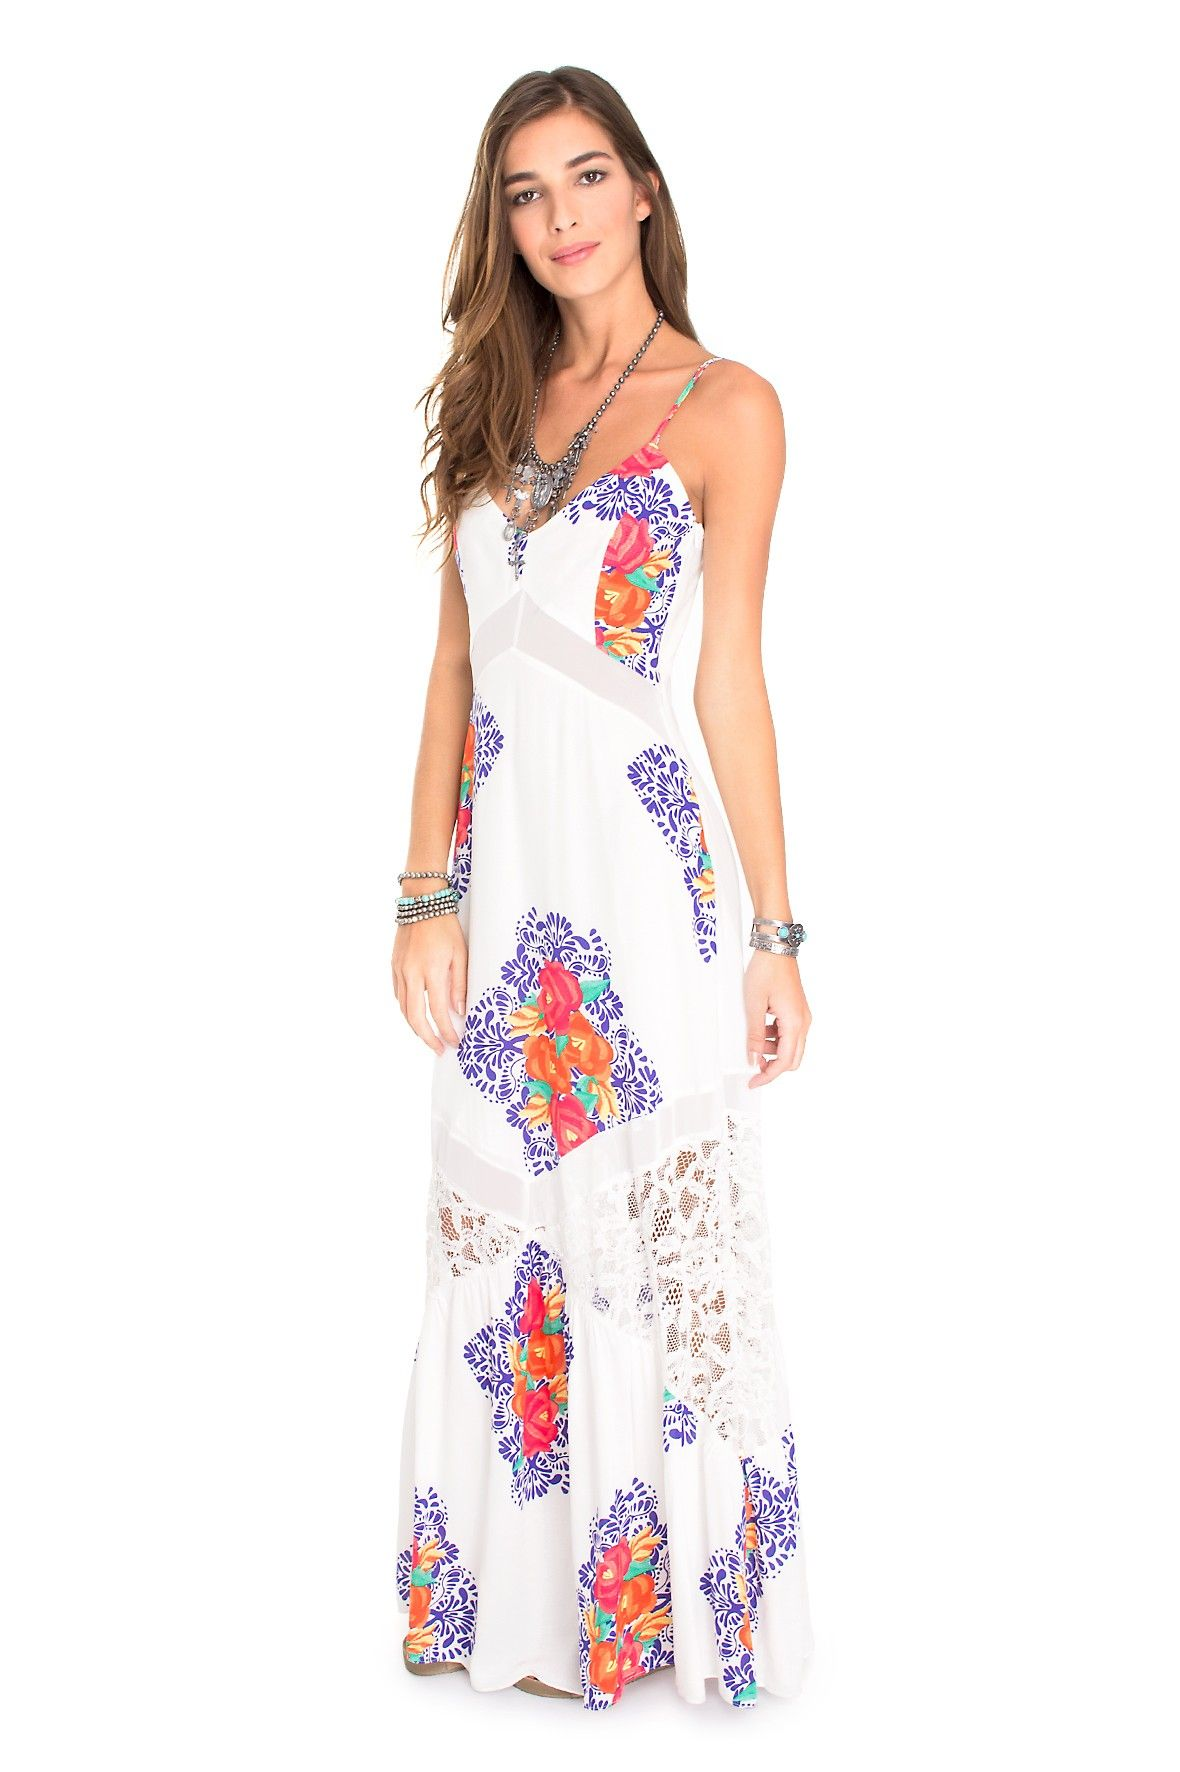 Longo Estampa Vestido Azulejo Floral De Ropa VestidosDress To fmIYg7ybv6